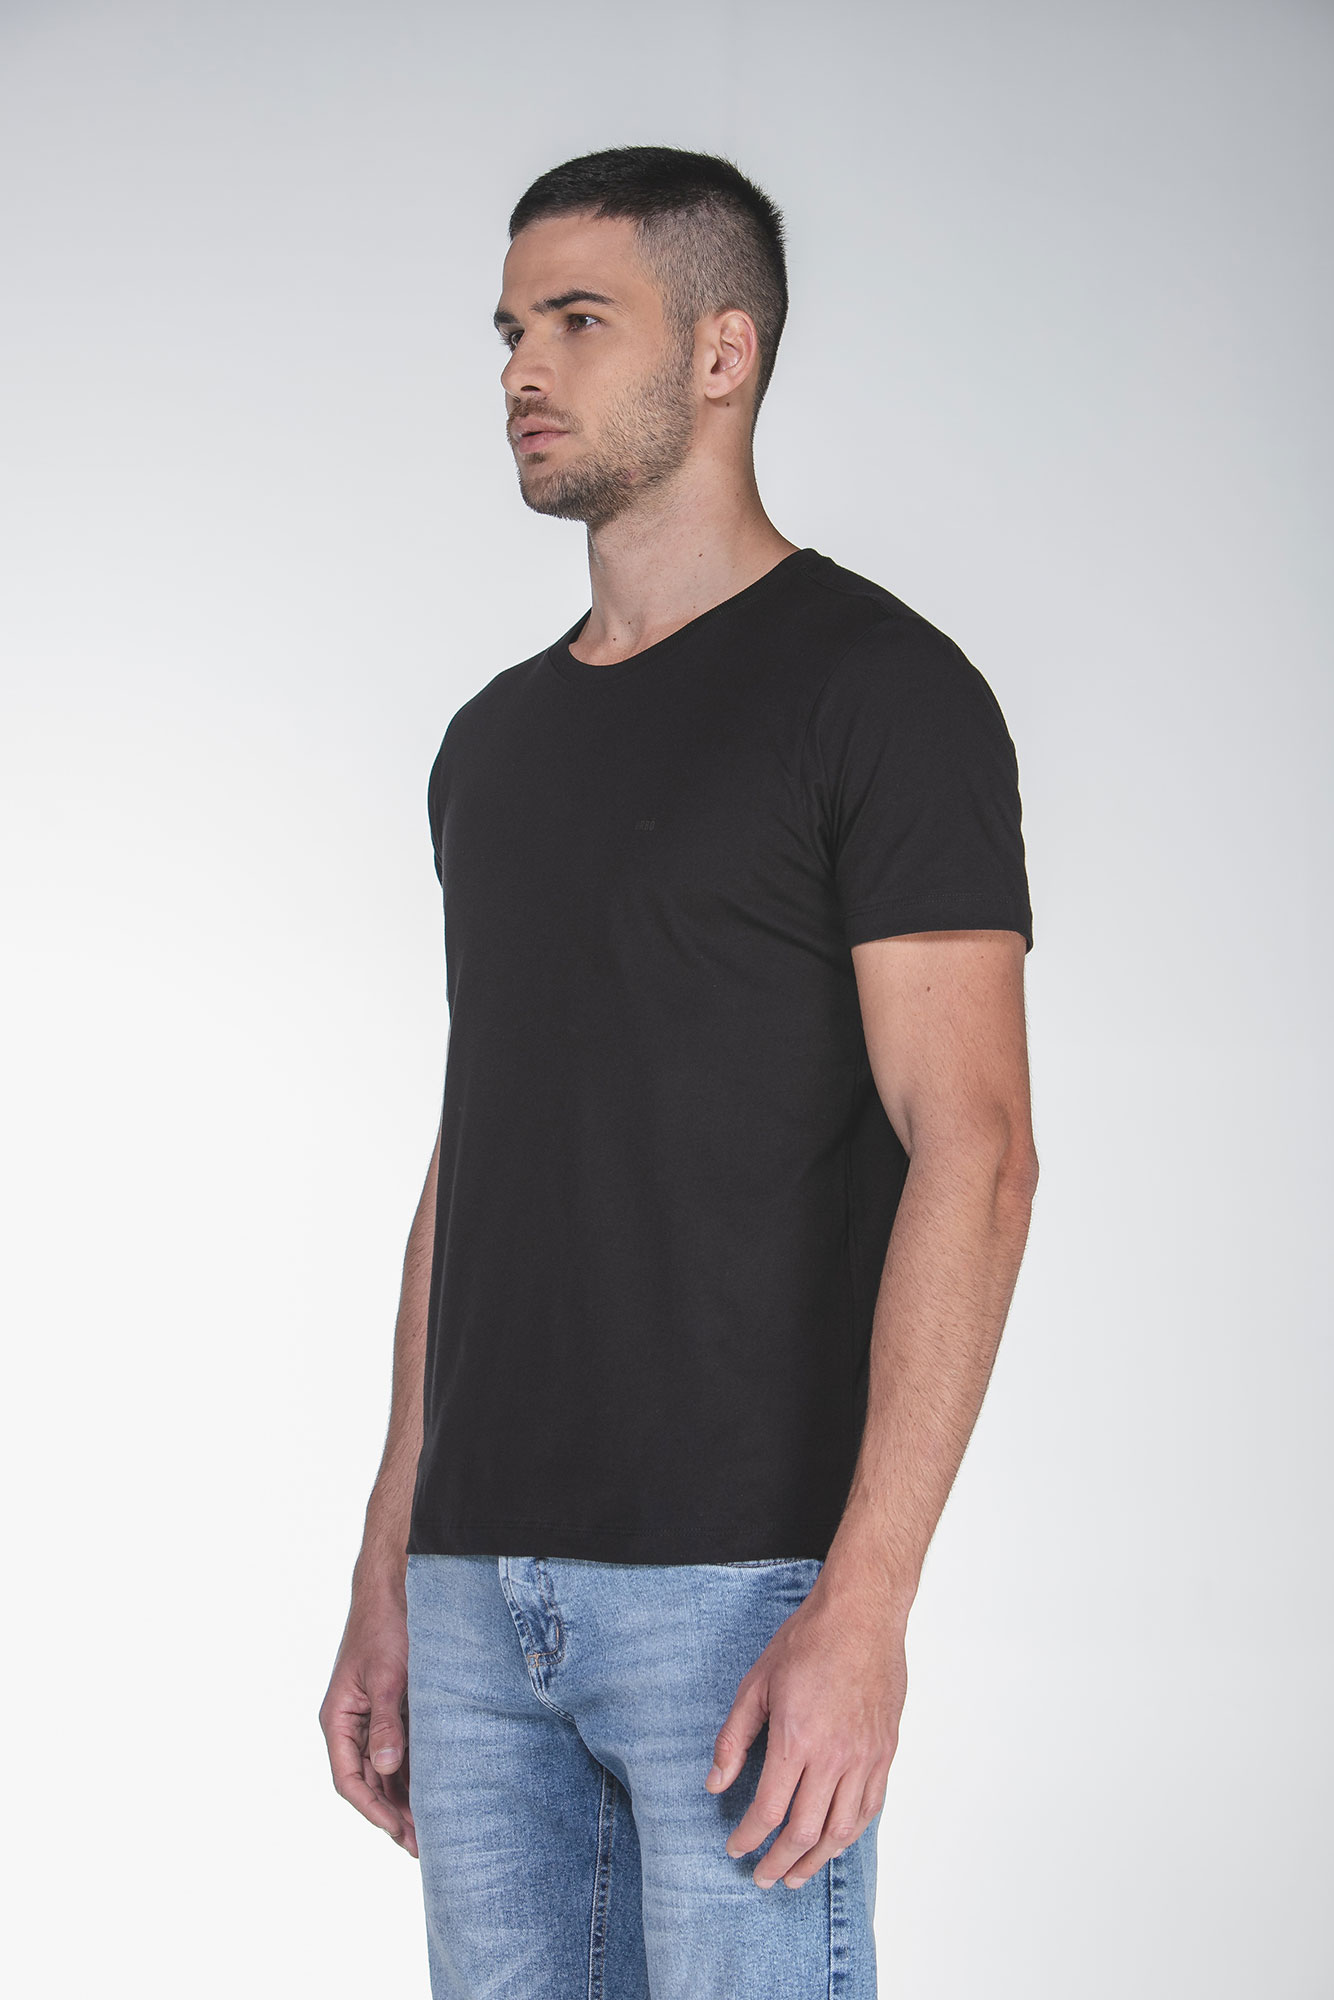 Camiseta Cotton Egypt Preto/Preto